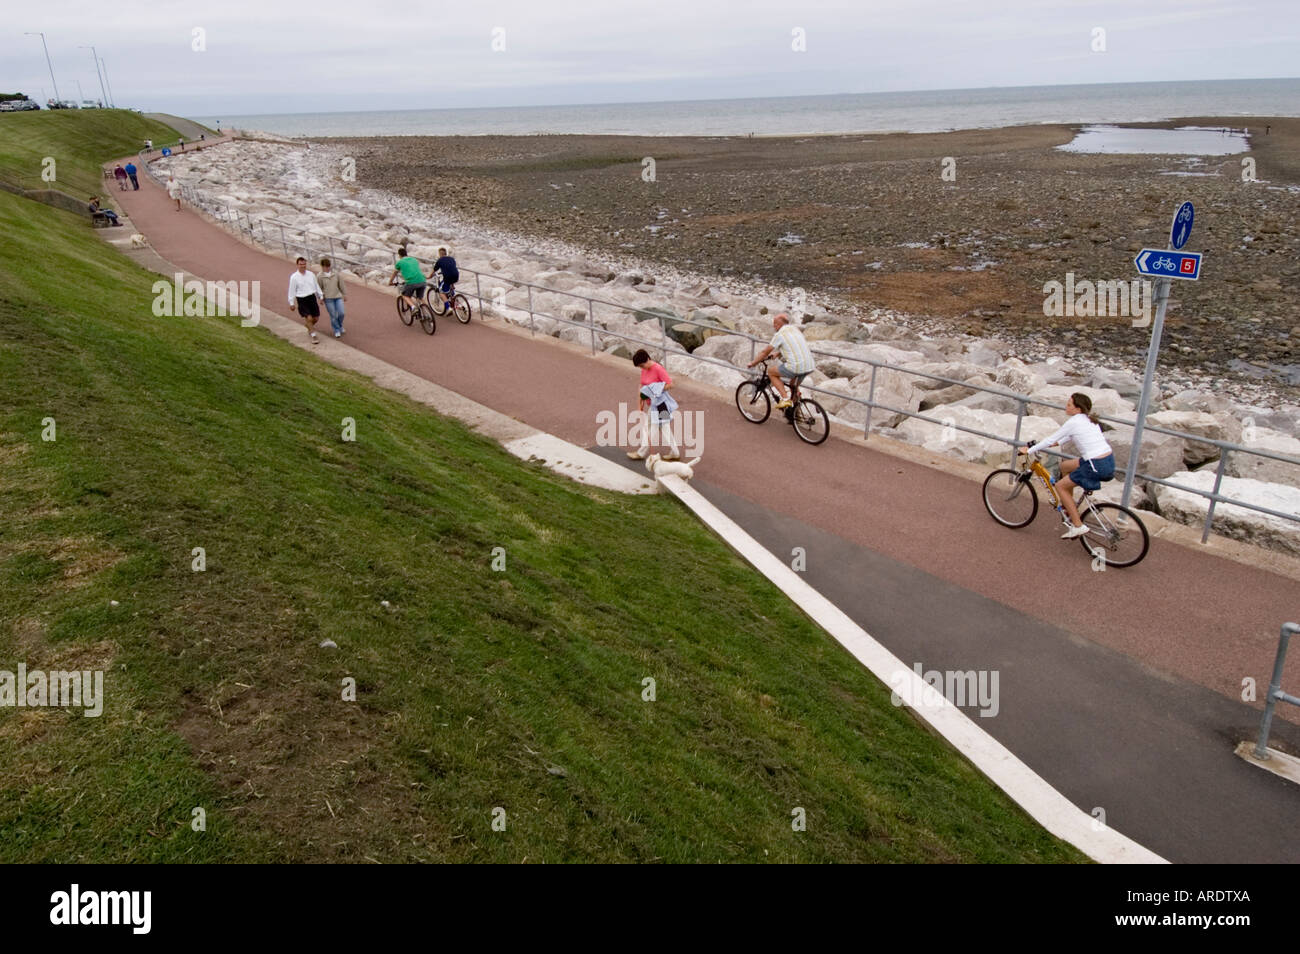 North Wales Cycle Path at Rhos on Sea - Stock Image